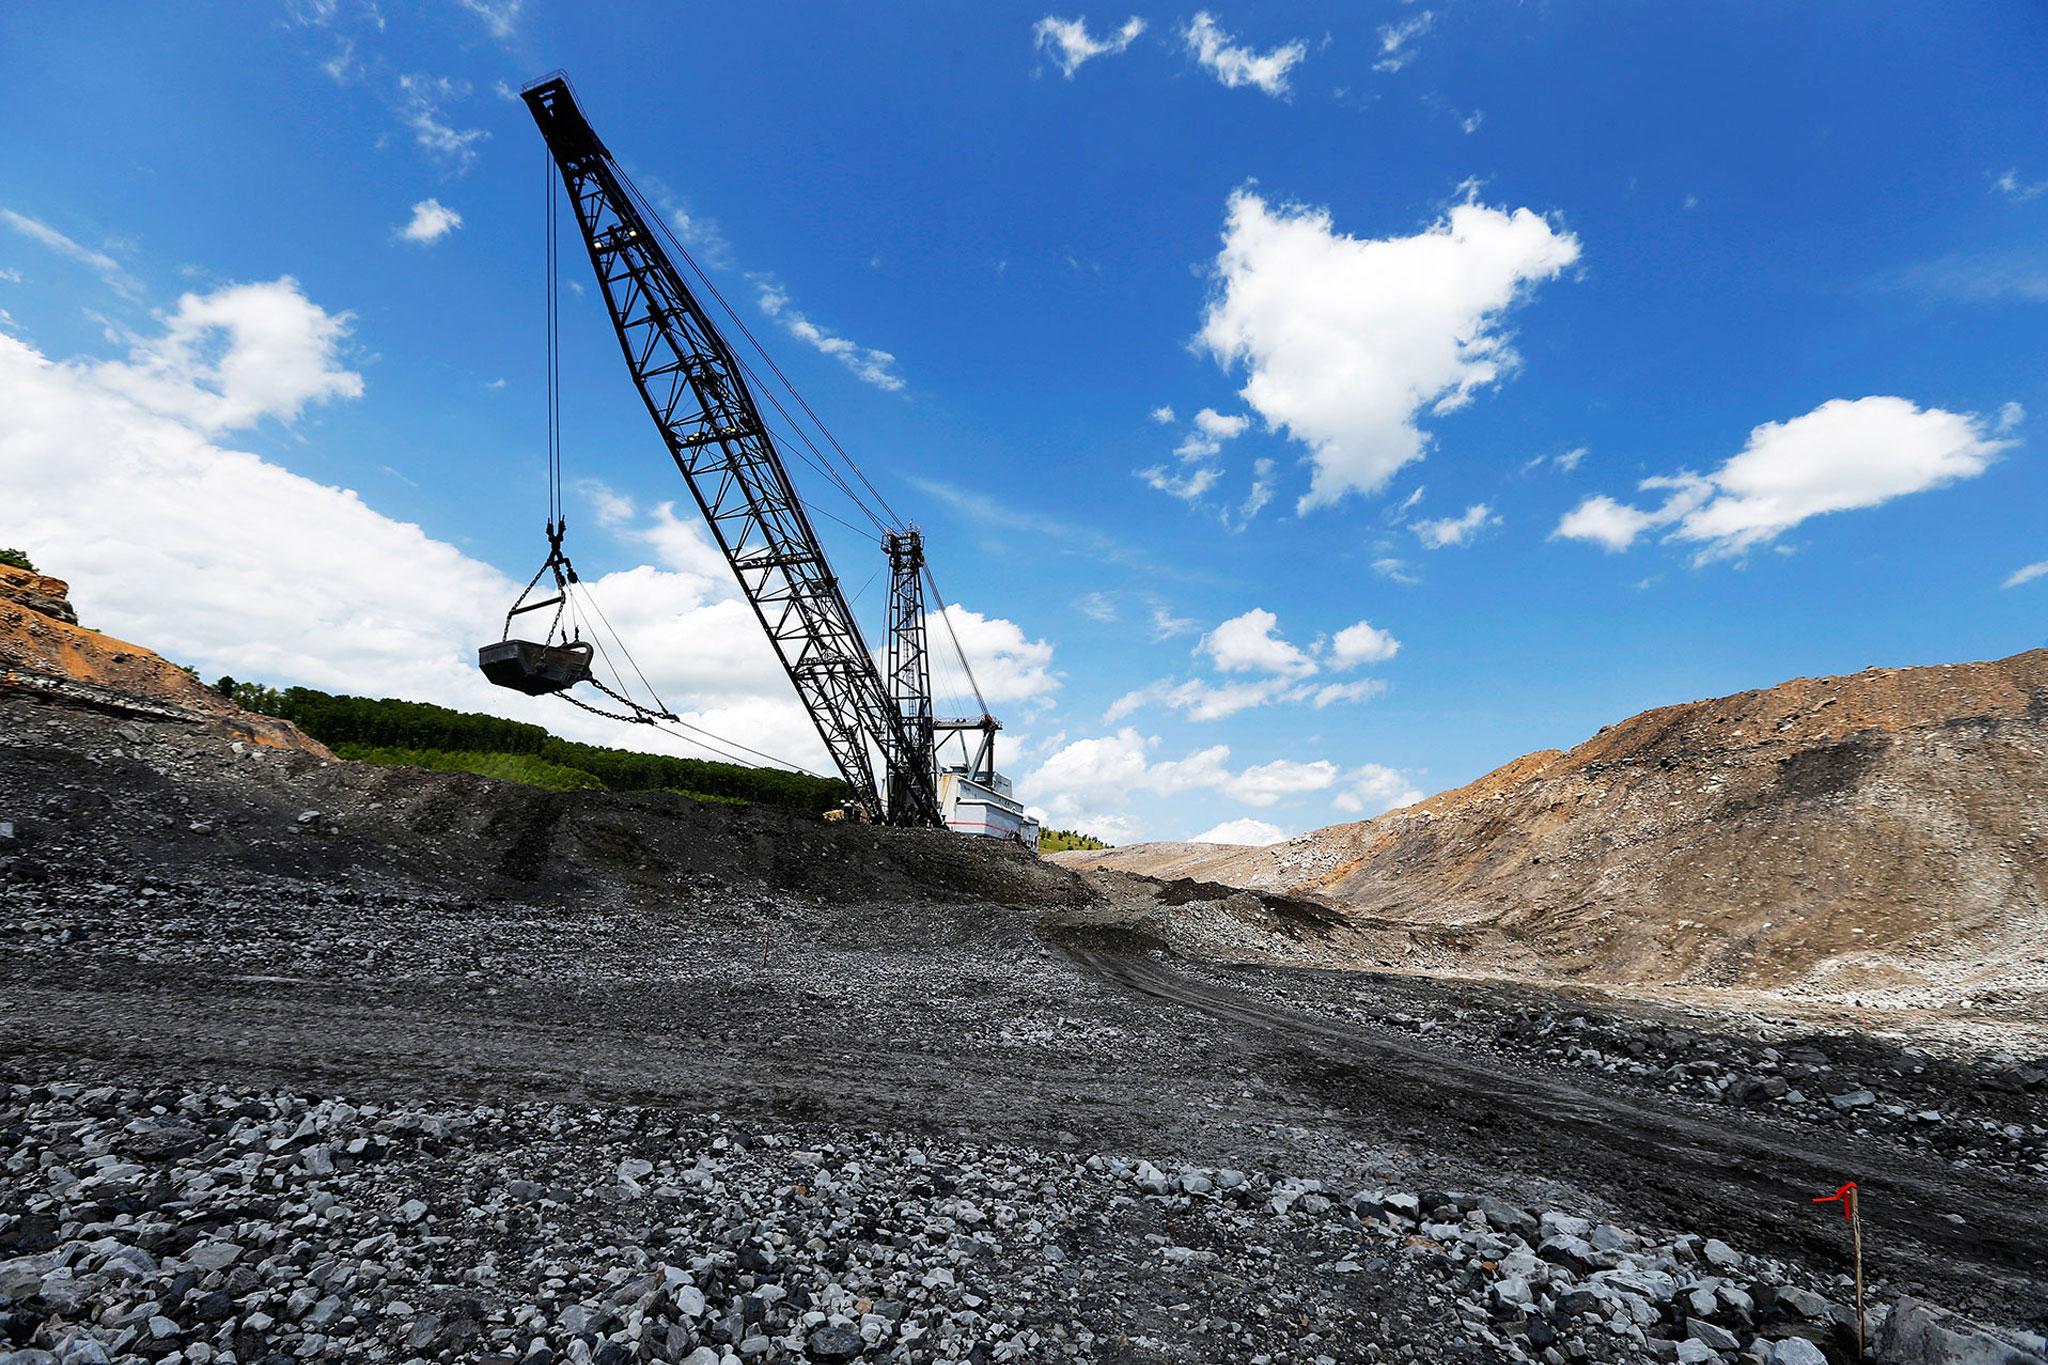 کارخانه زغال شویی پابدانا